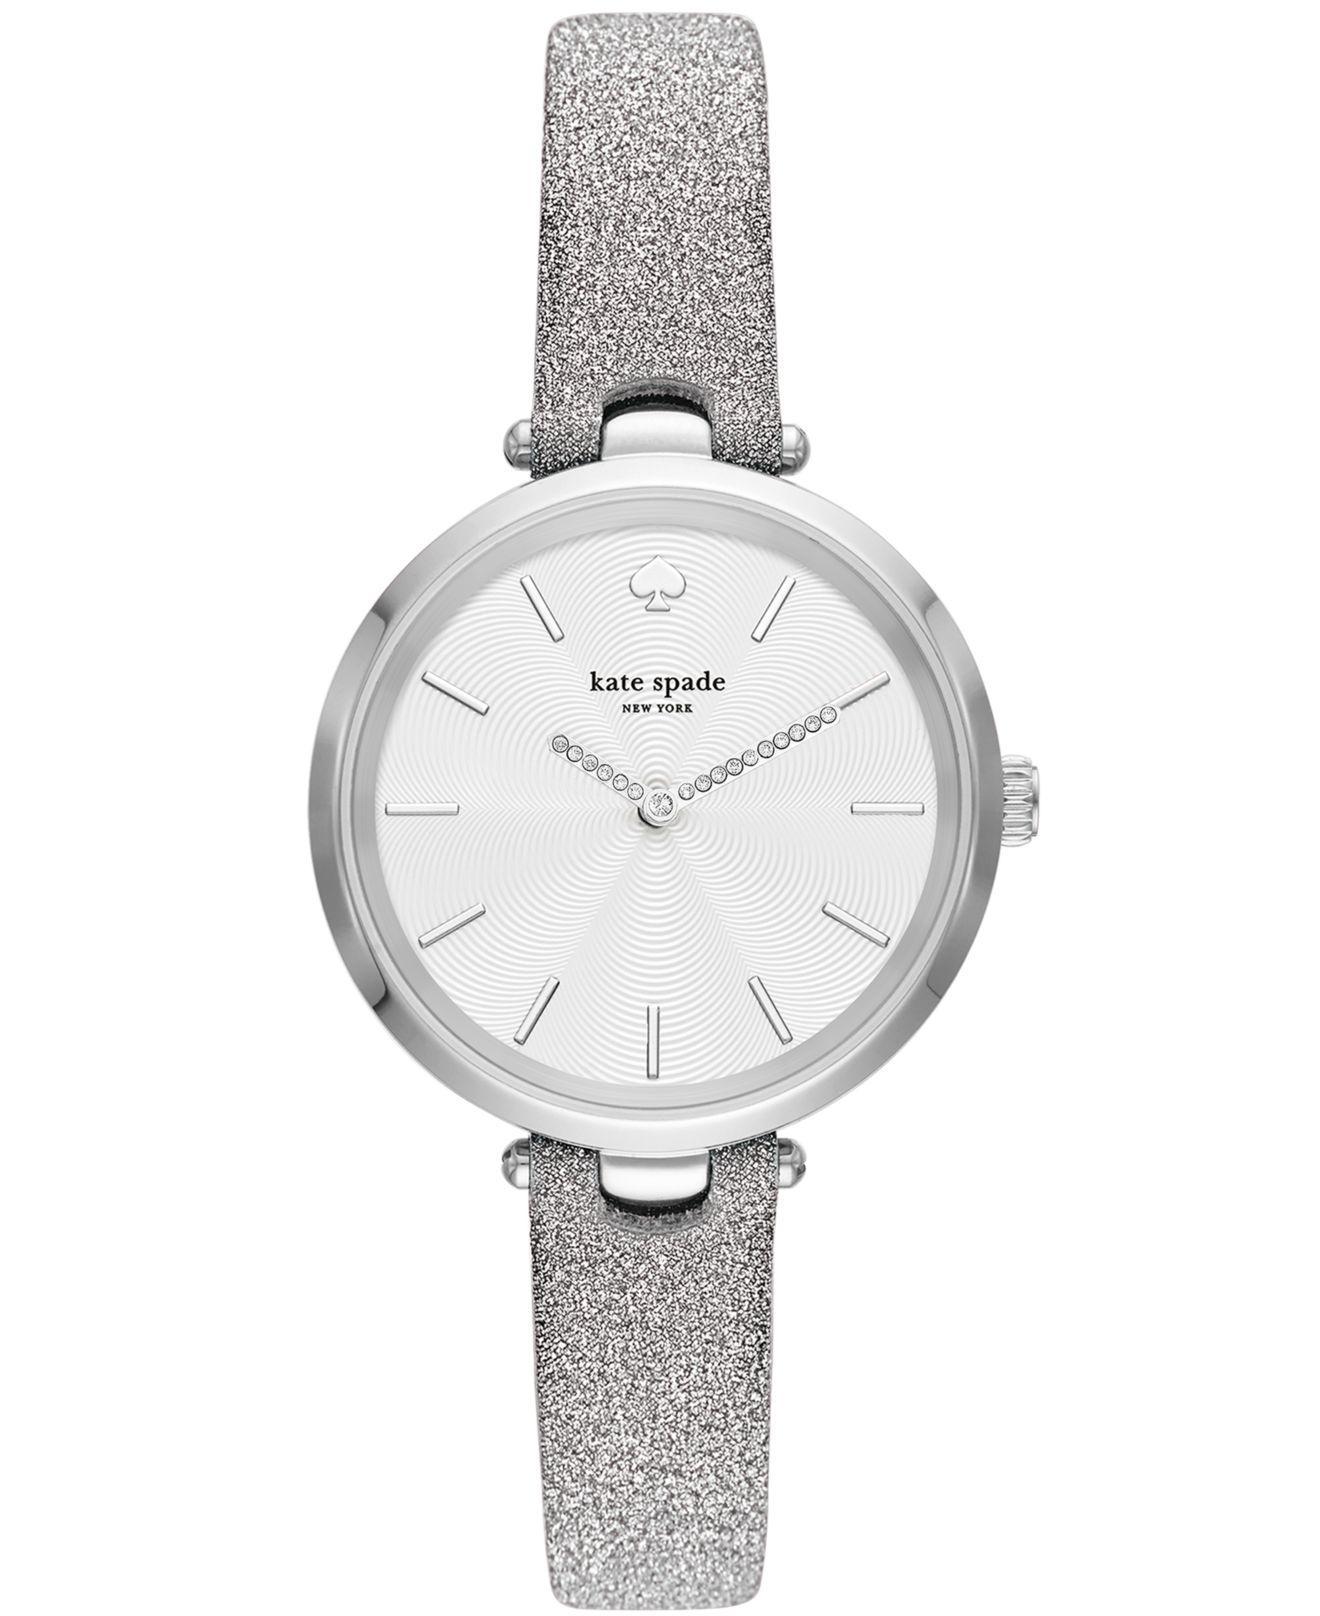 f11fe31fca9 Kate Spade - Metallic Holland Silver-tone Leather Strap Watch 34mm - Lyst.  View fullscreen